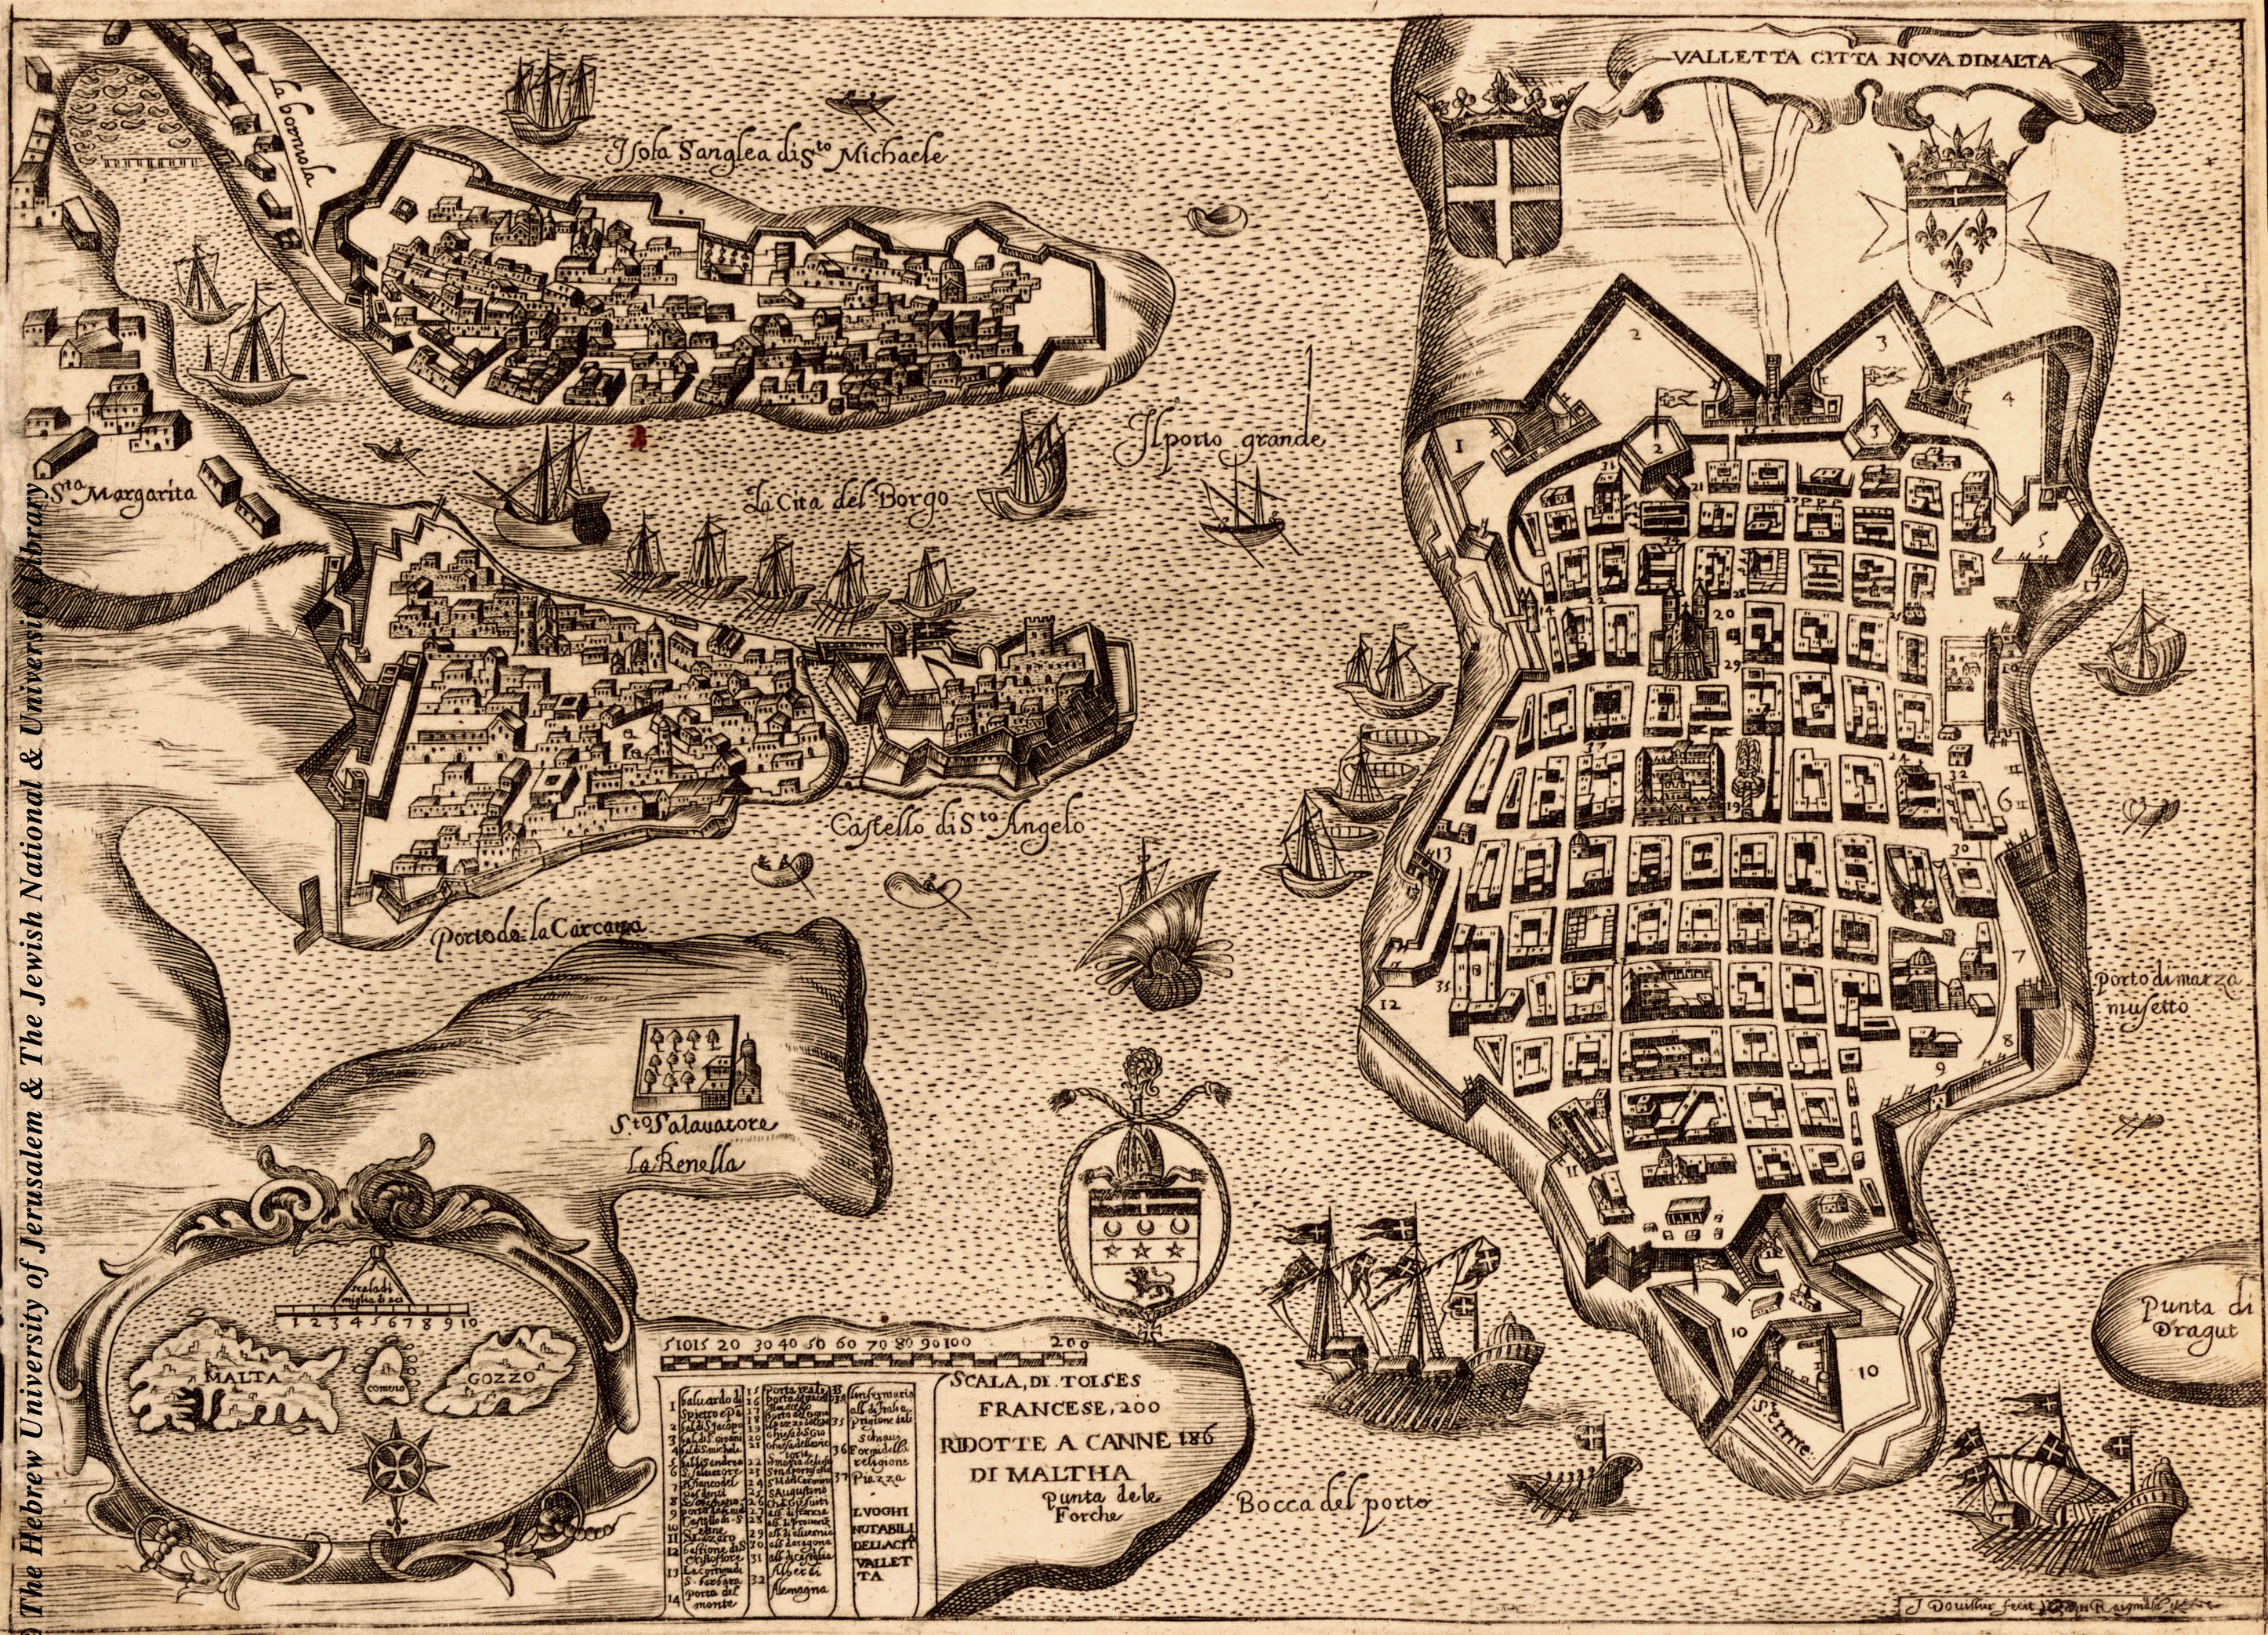 Map of Valletta, 1643